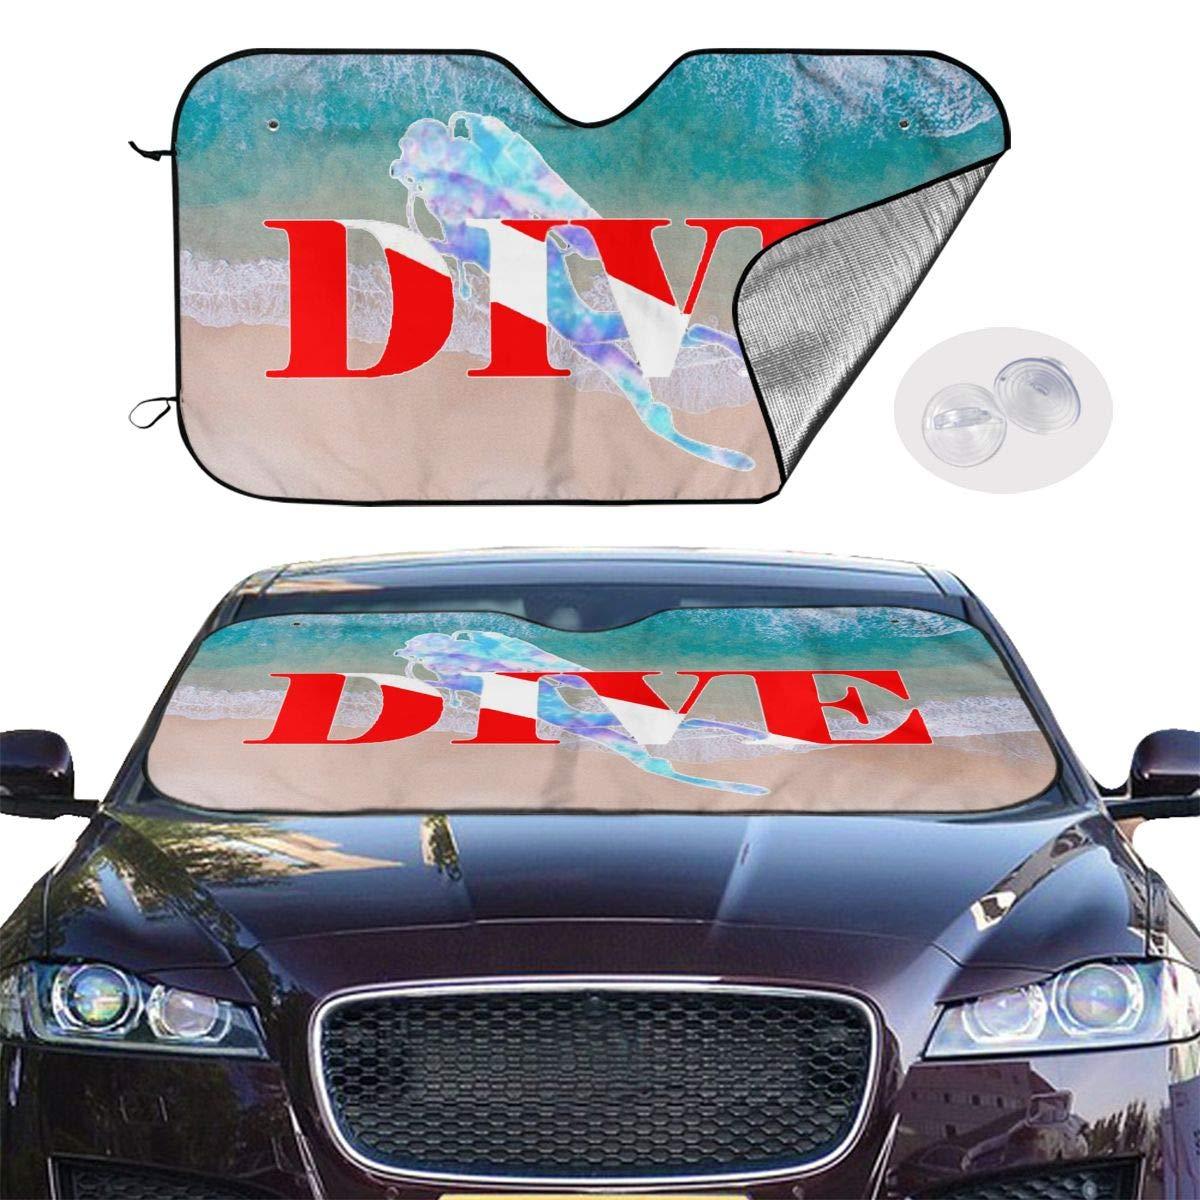 ASDD Scuba Diver Dive Down Flag Dive Windshield Sun Shade ~Universal Fit Car Sun Shade,Keep Your Vehicle Cool ~2 Sizes